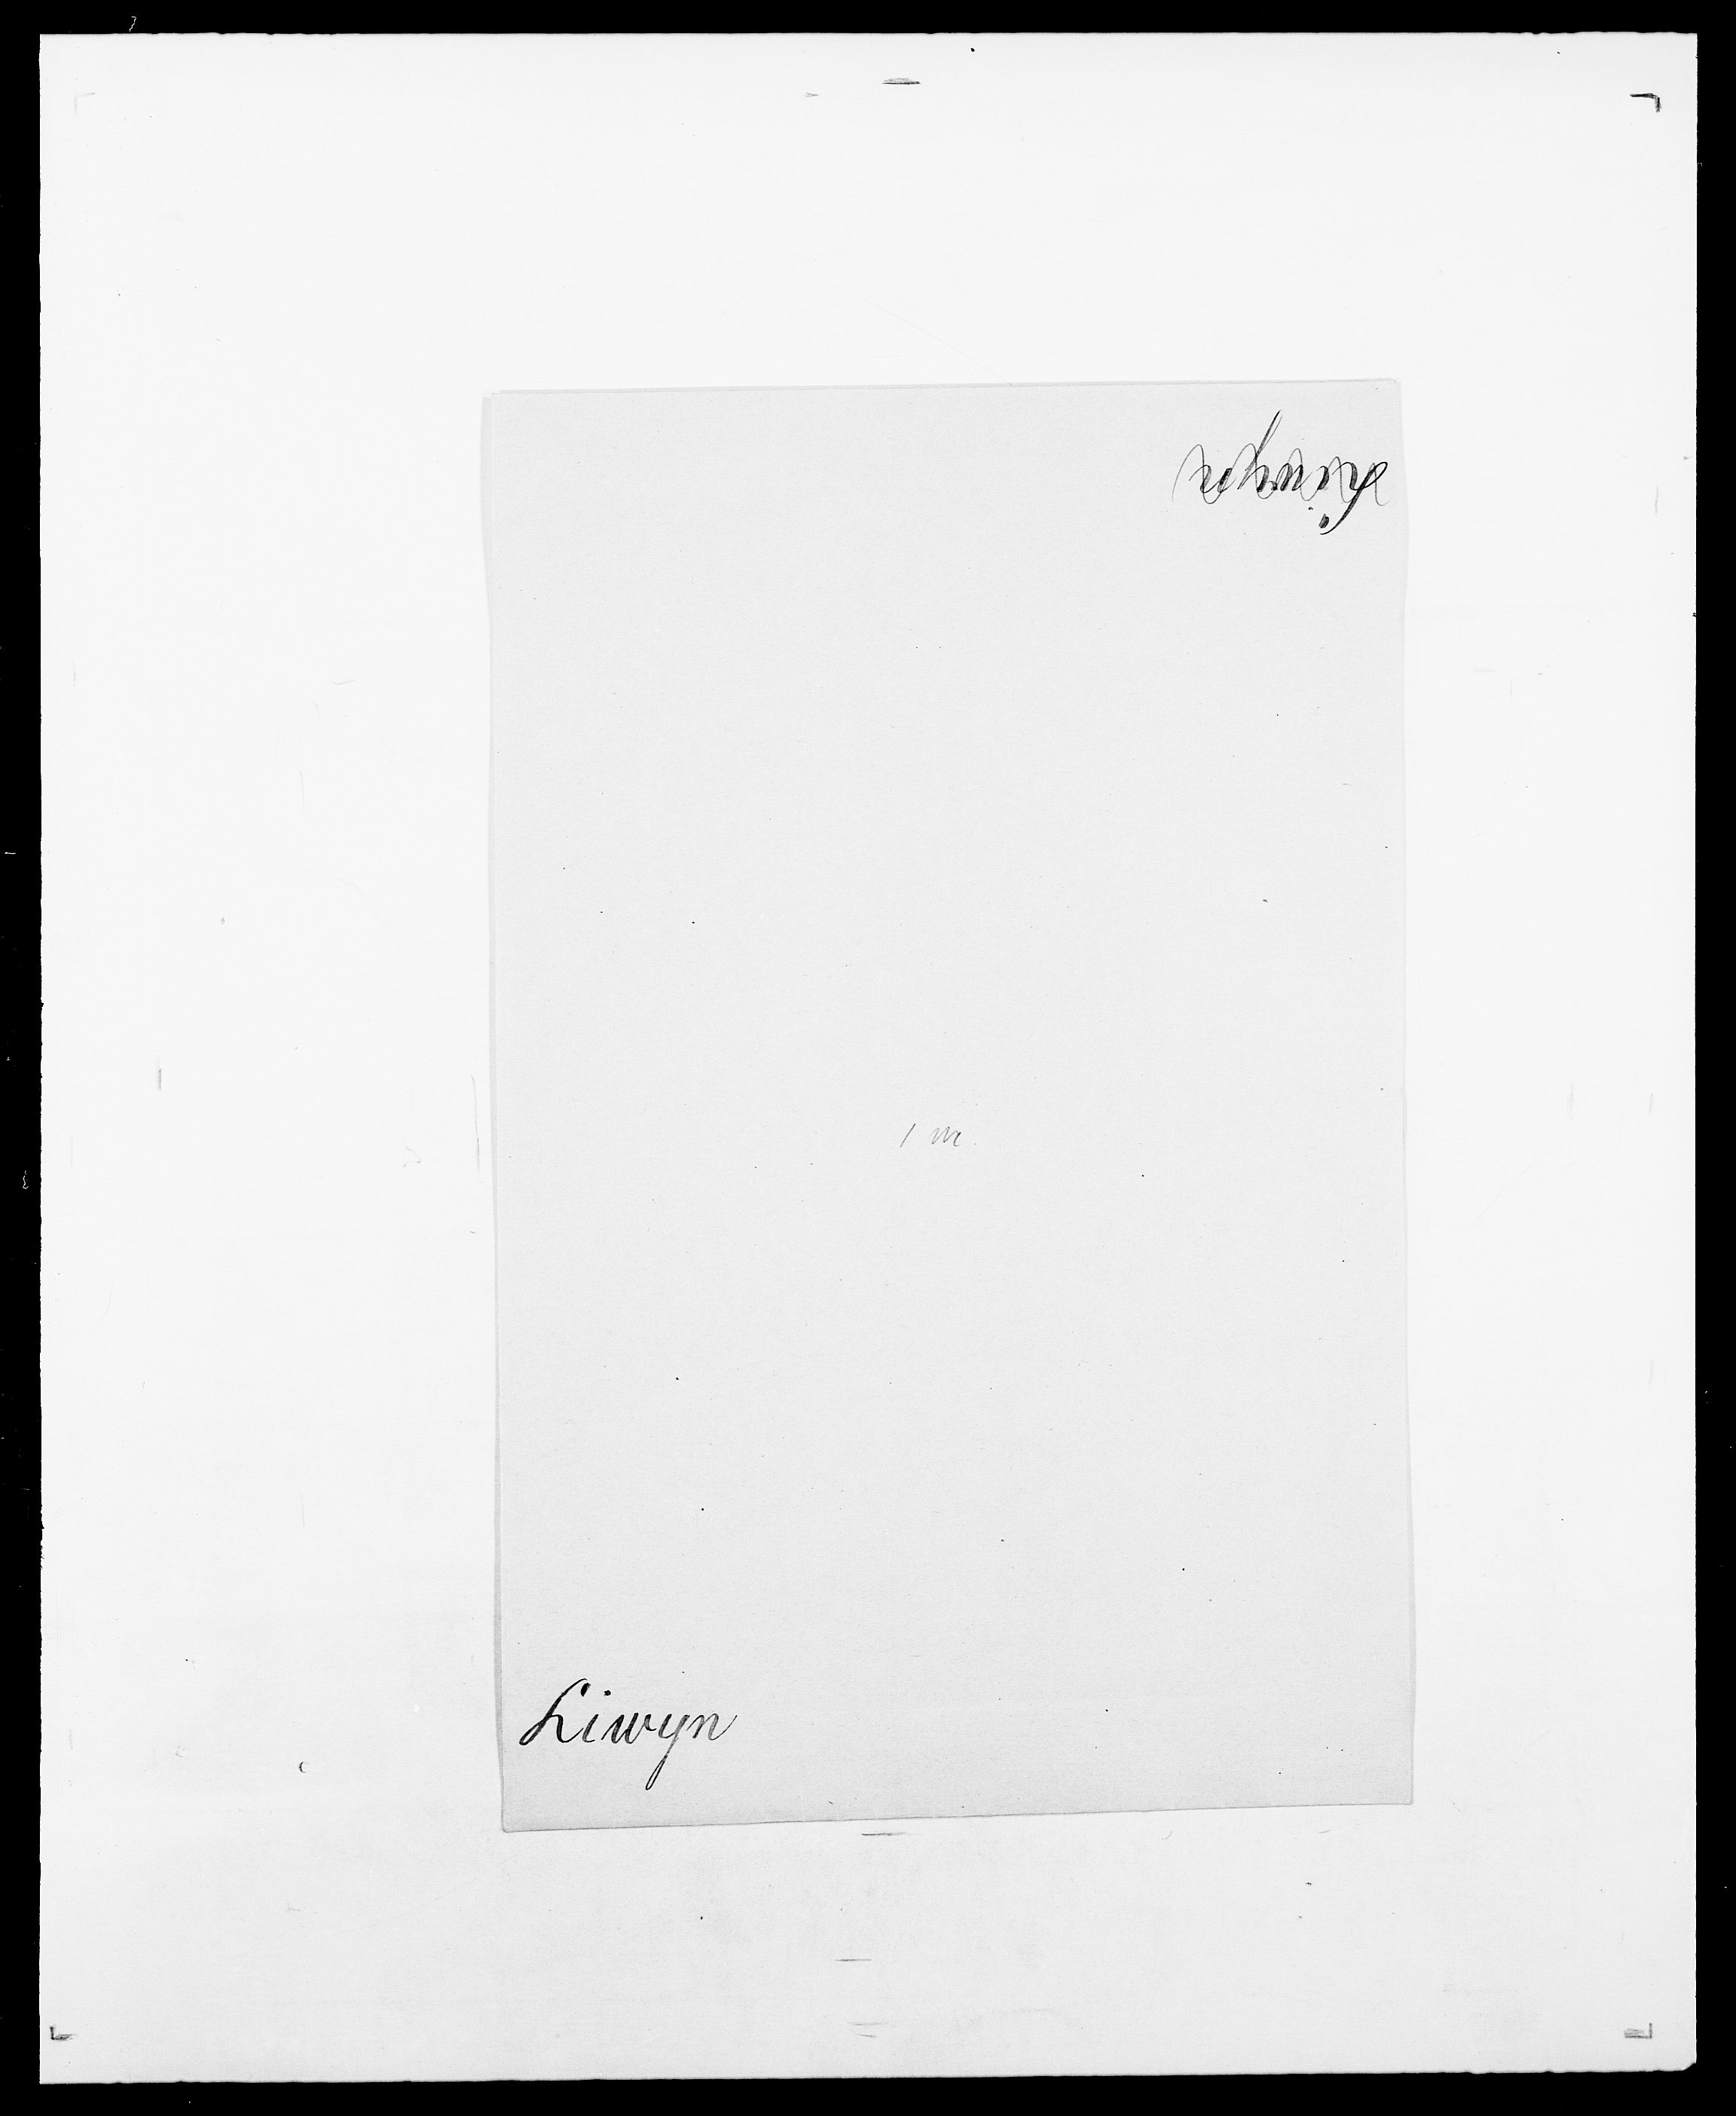 SAO, Delgobe, Charles Antoine - samling, D/Da/L0023: Lau - Lirvyn, s. 715